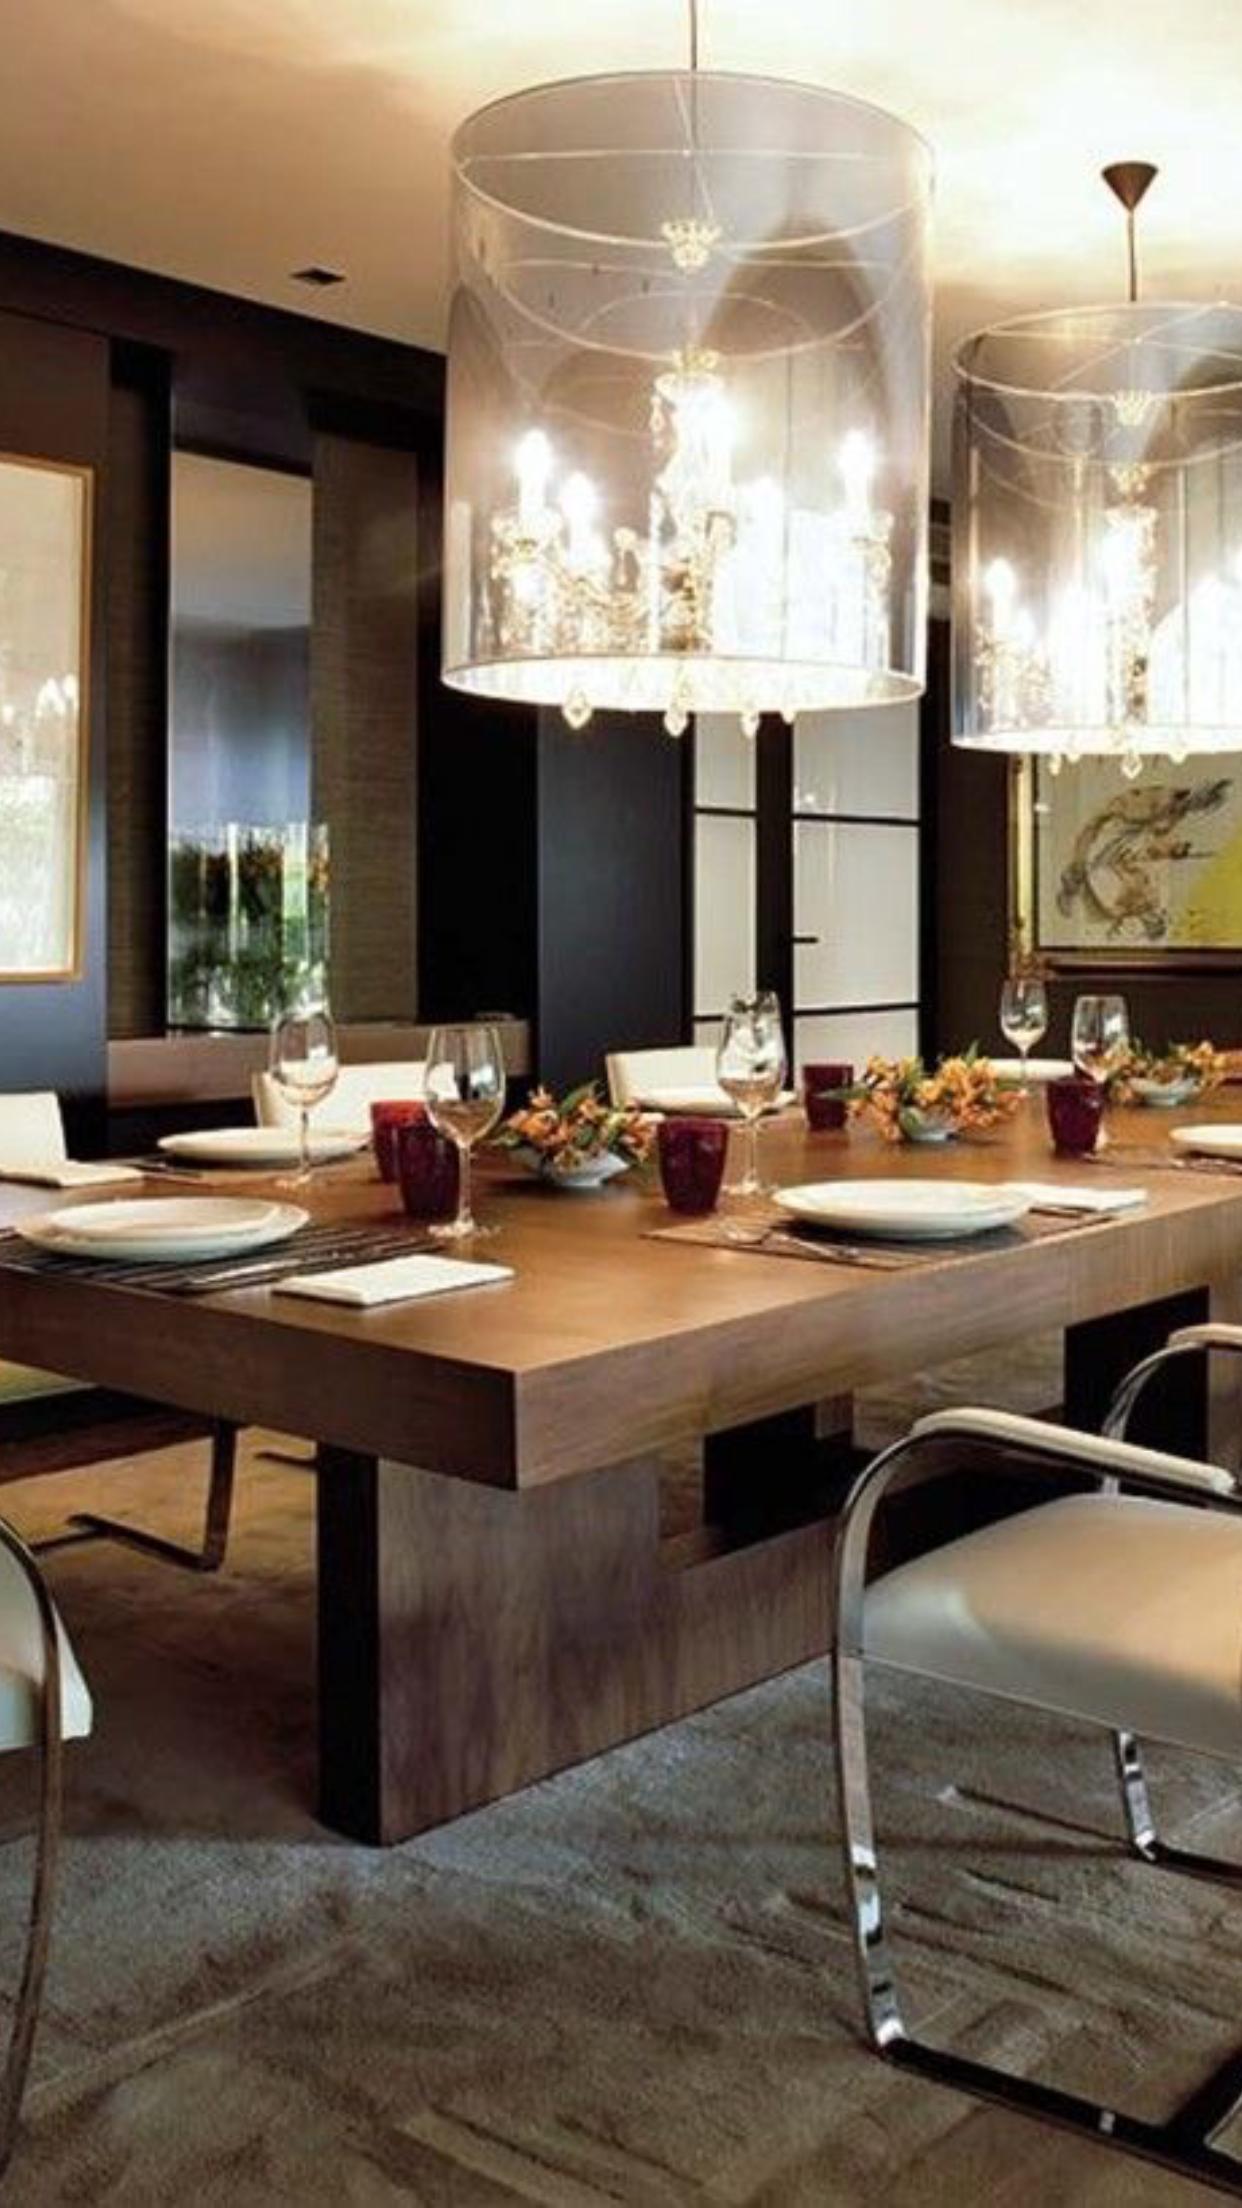 Pin By Kawita Lalsing On Mesas Dining Room Design Large Dining Room Dining Room Sets